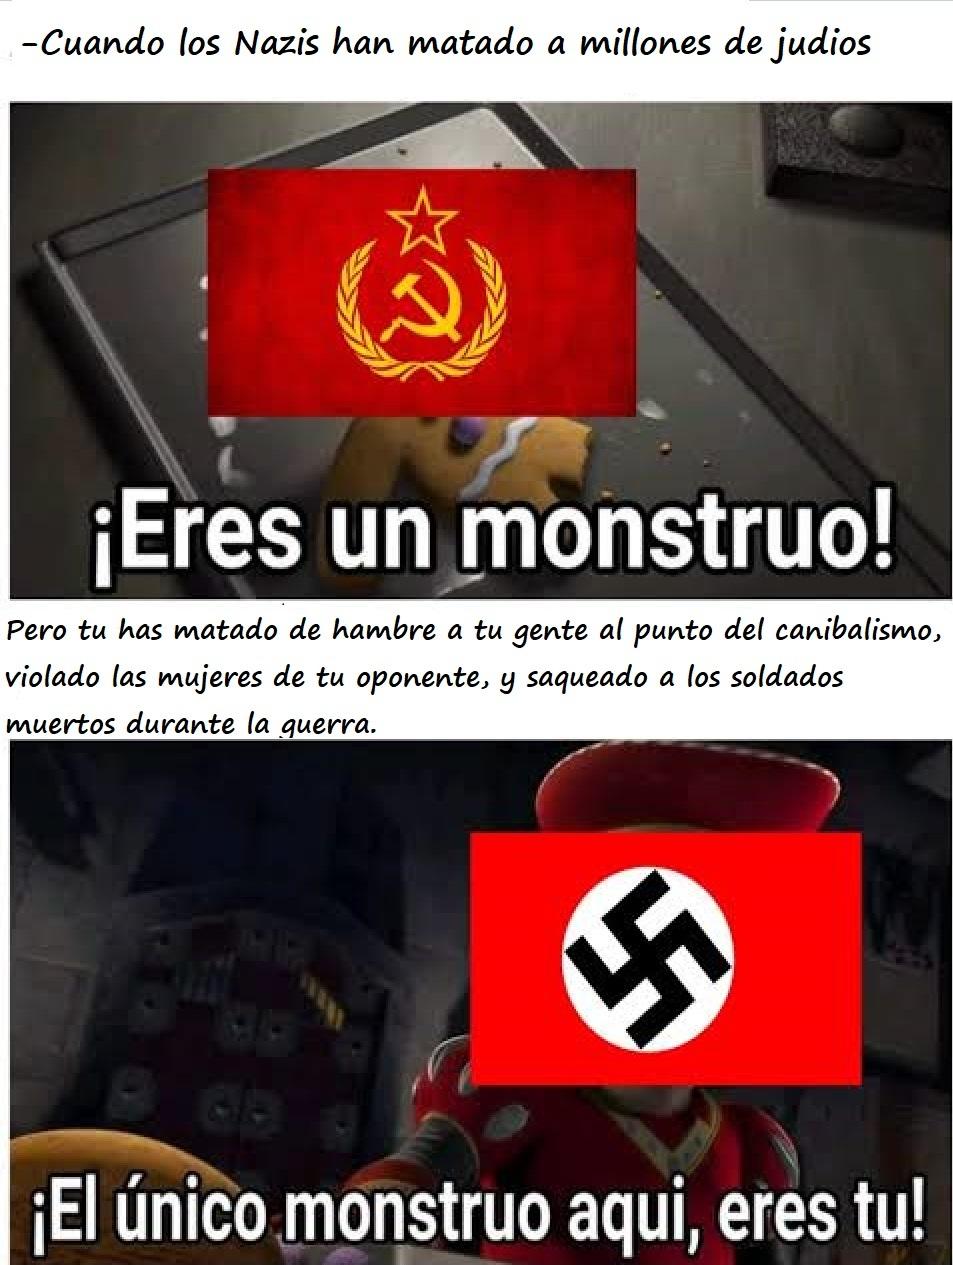 Peores que los nazis - meme